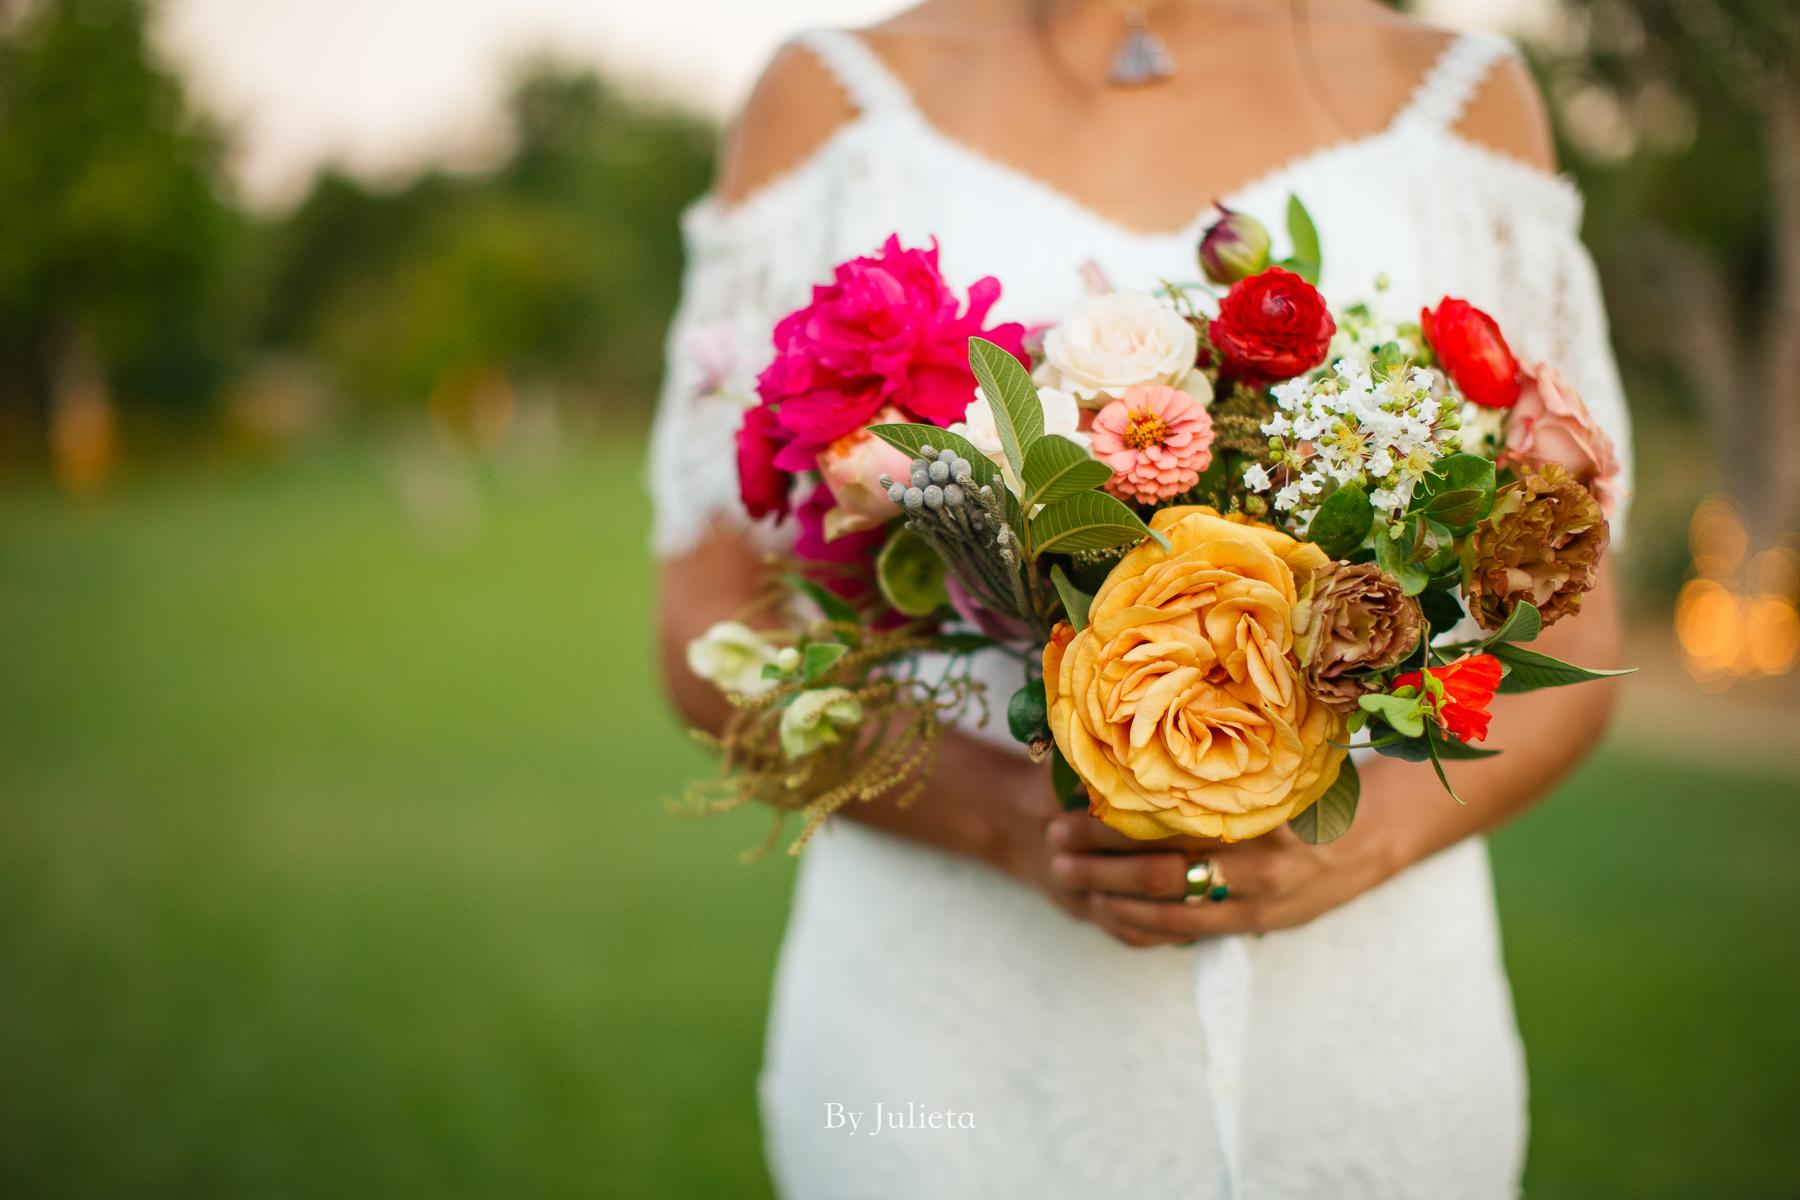 Floras Farm Cabo Wedding, Sory and Kane, Julieta Amezcua Photography. (290 of 364).jpg